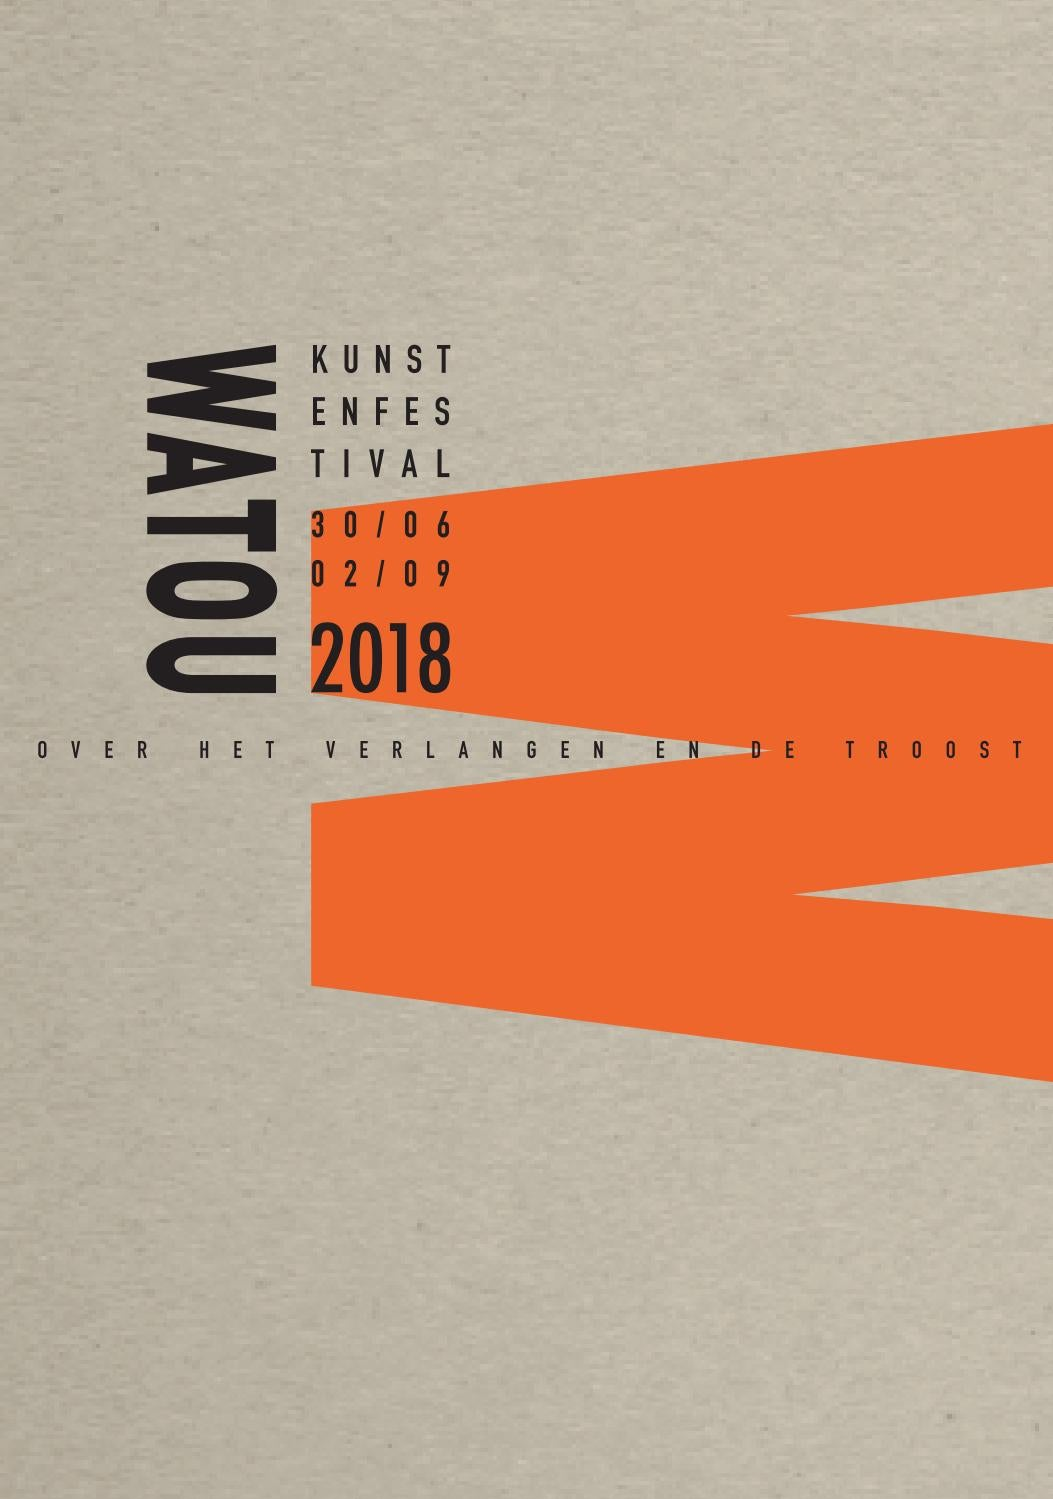 Catalogus Watou 2018 By Vzwkunst Issuu